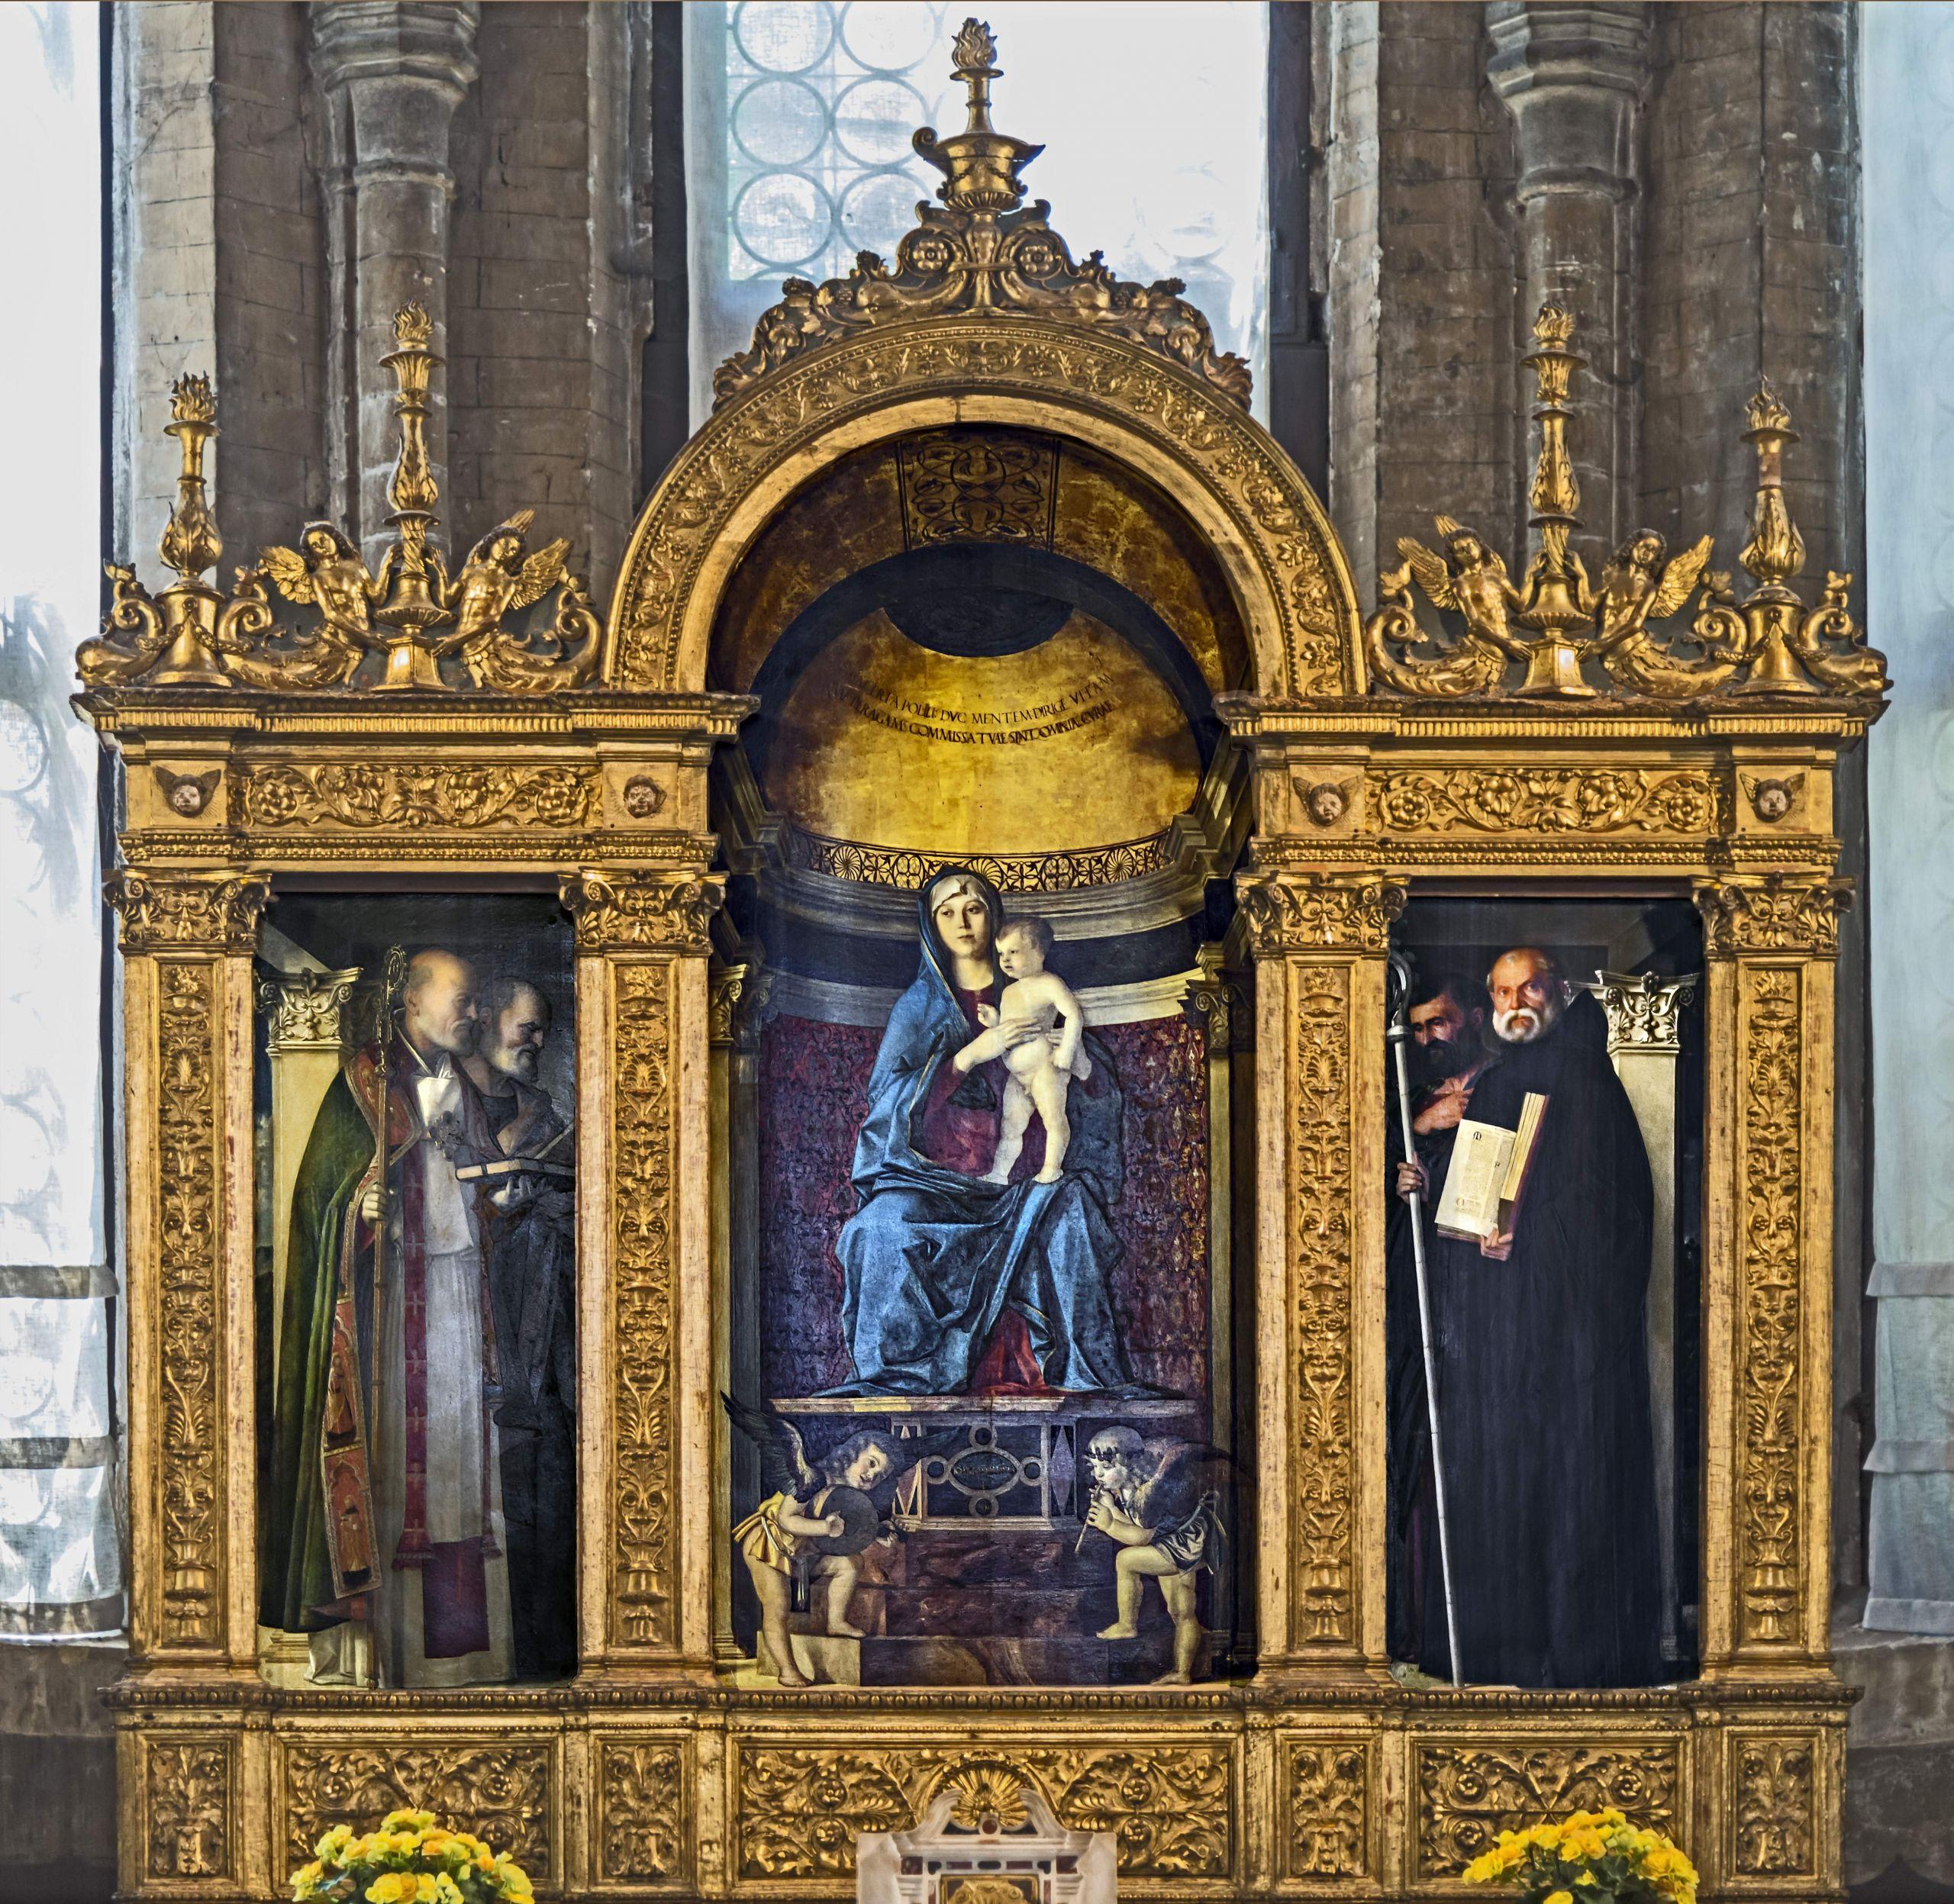 Frari Venice Sacristy triptych by Giovanni Bellini